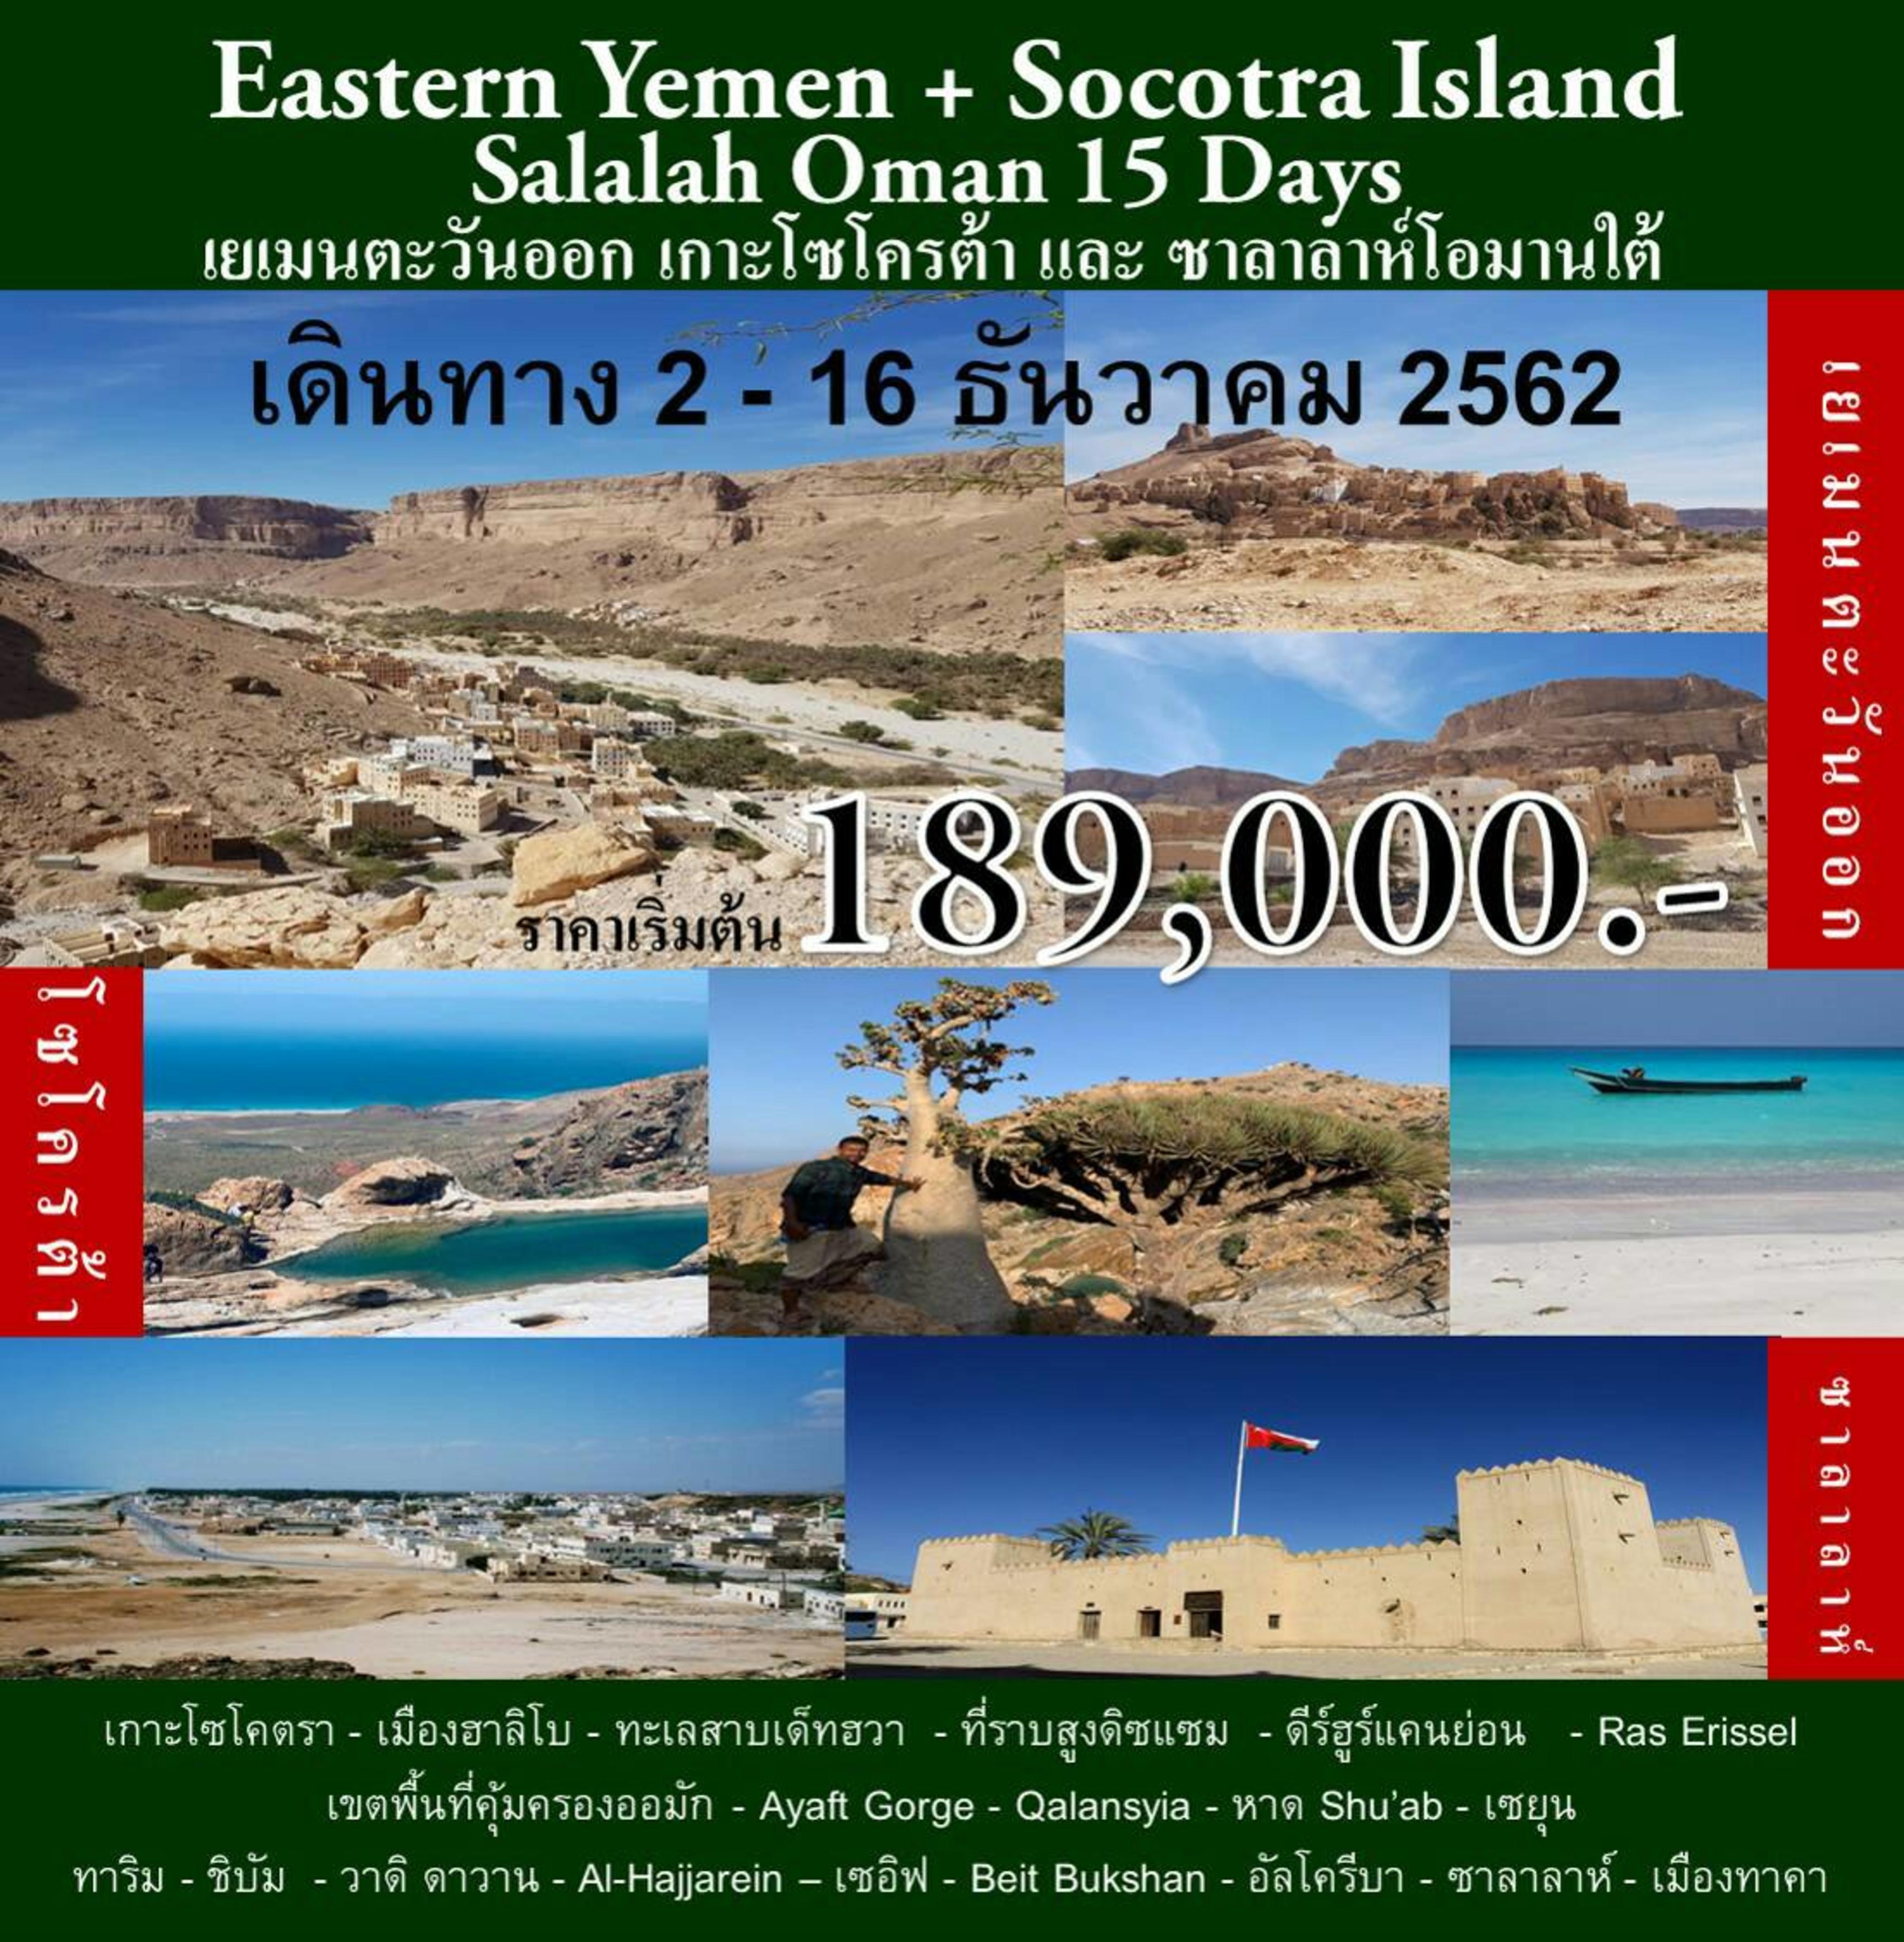 Eastern Yemen + Socotra Island and Salalah Oman 15 days